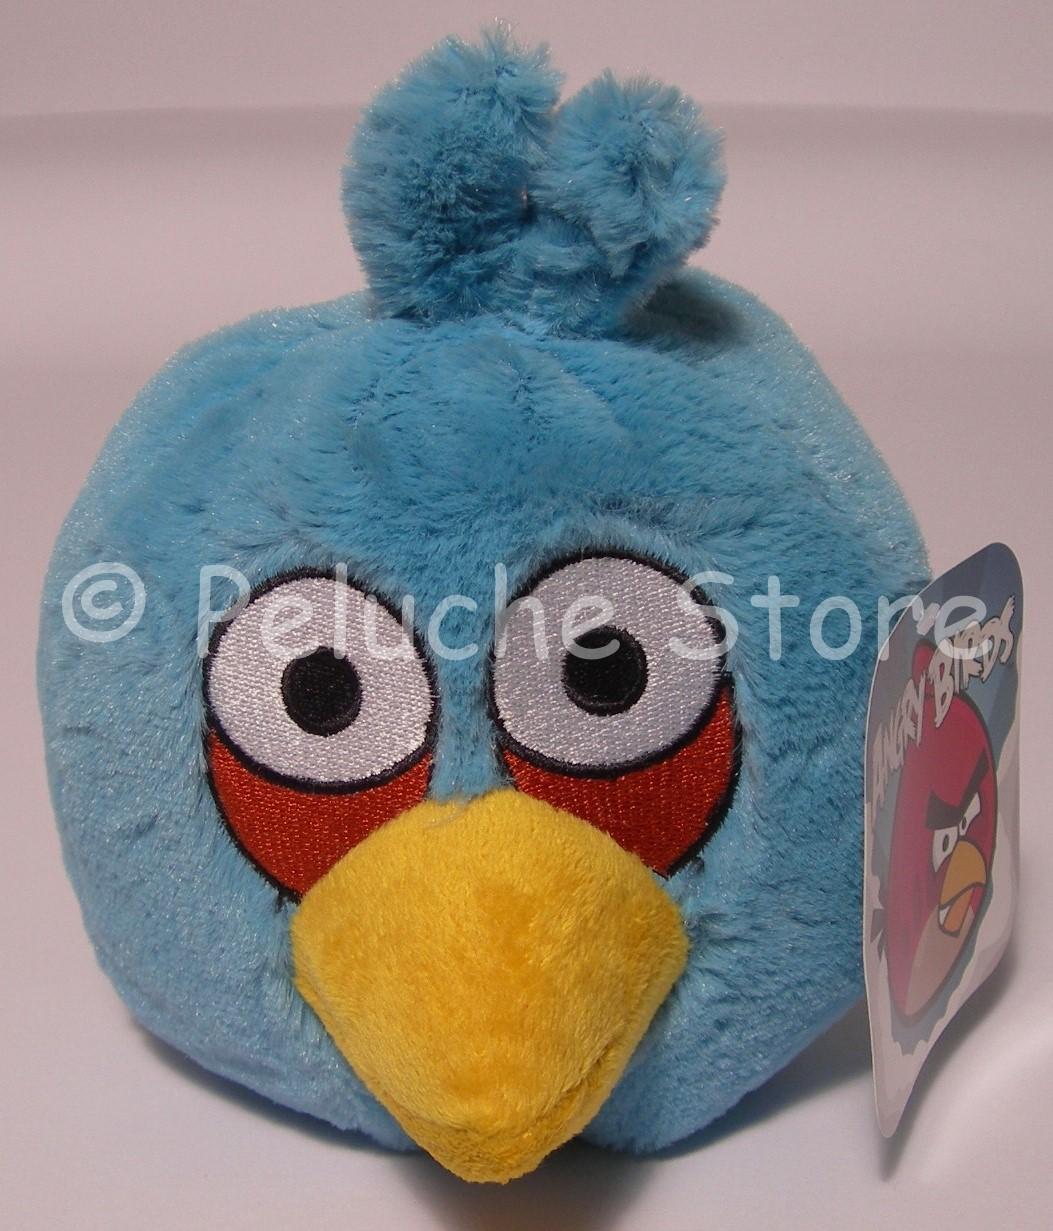 Angry Birds Blue azzurro peluche 15 cm Qualità velluto Originale